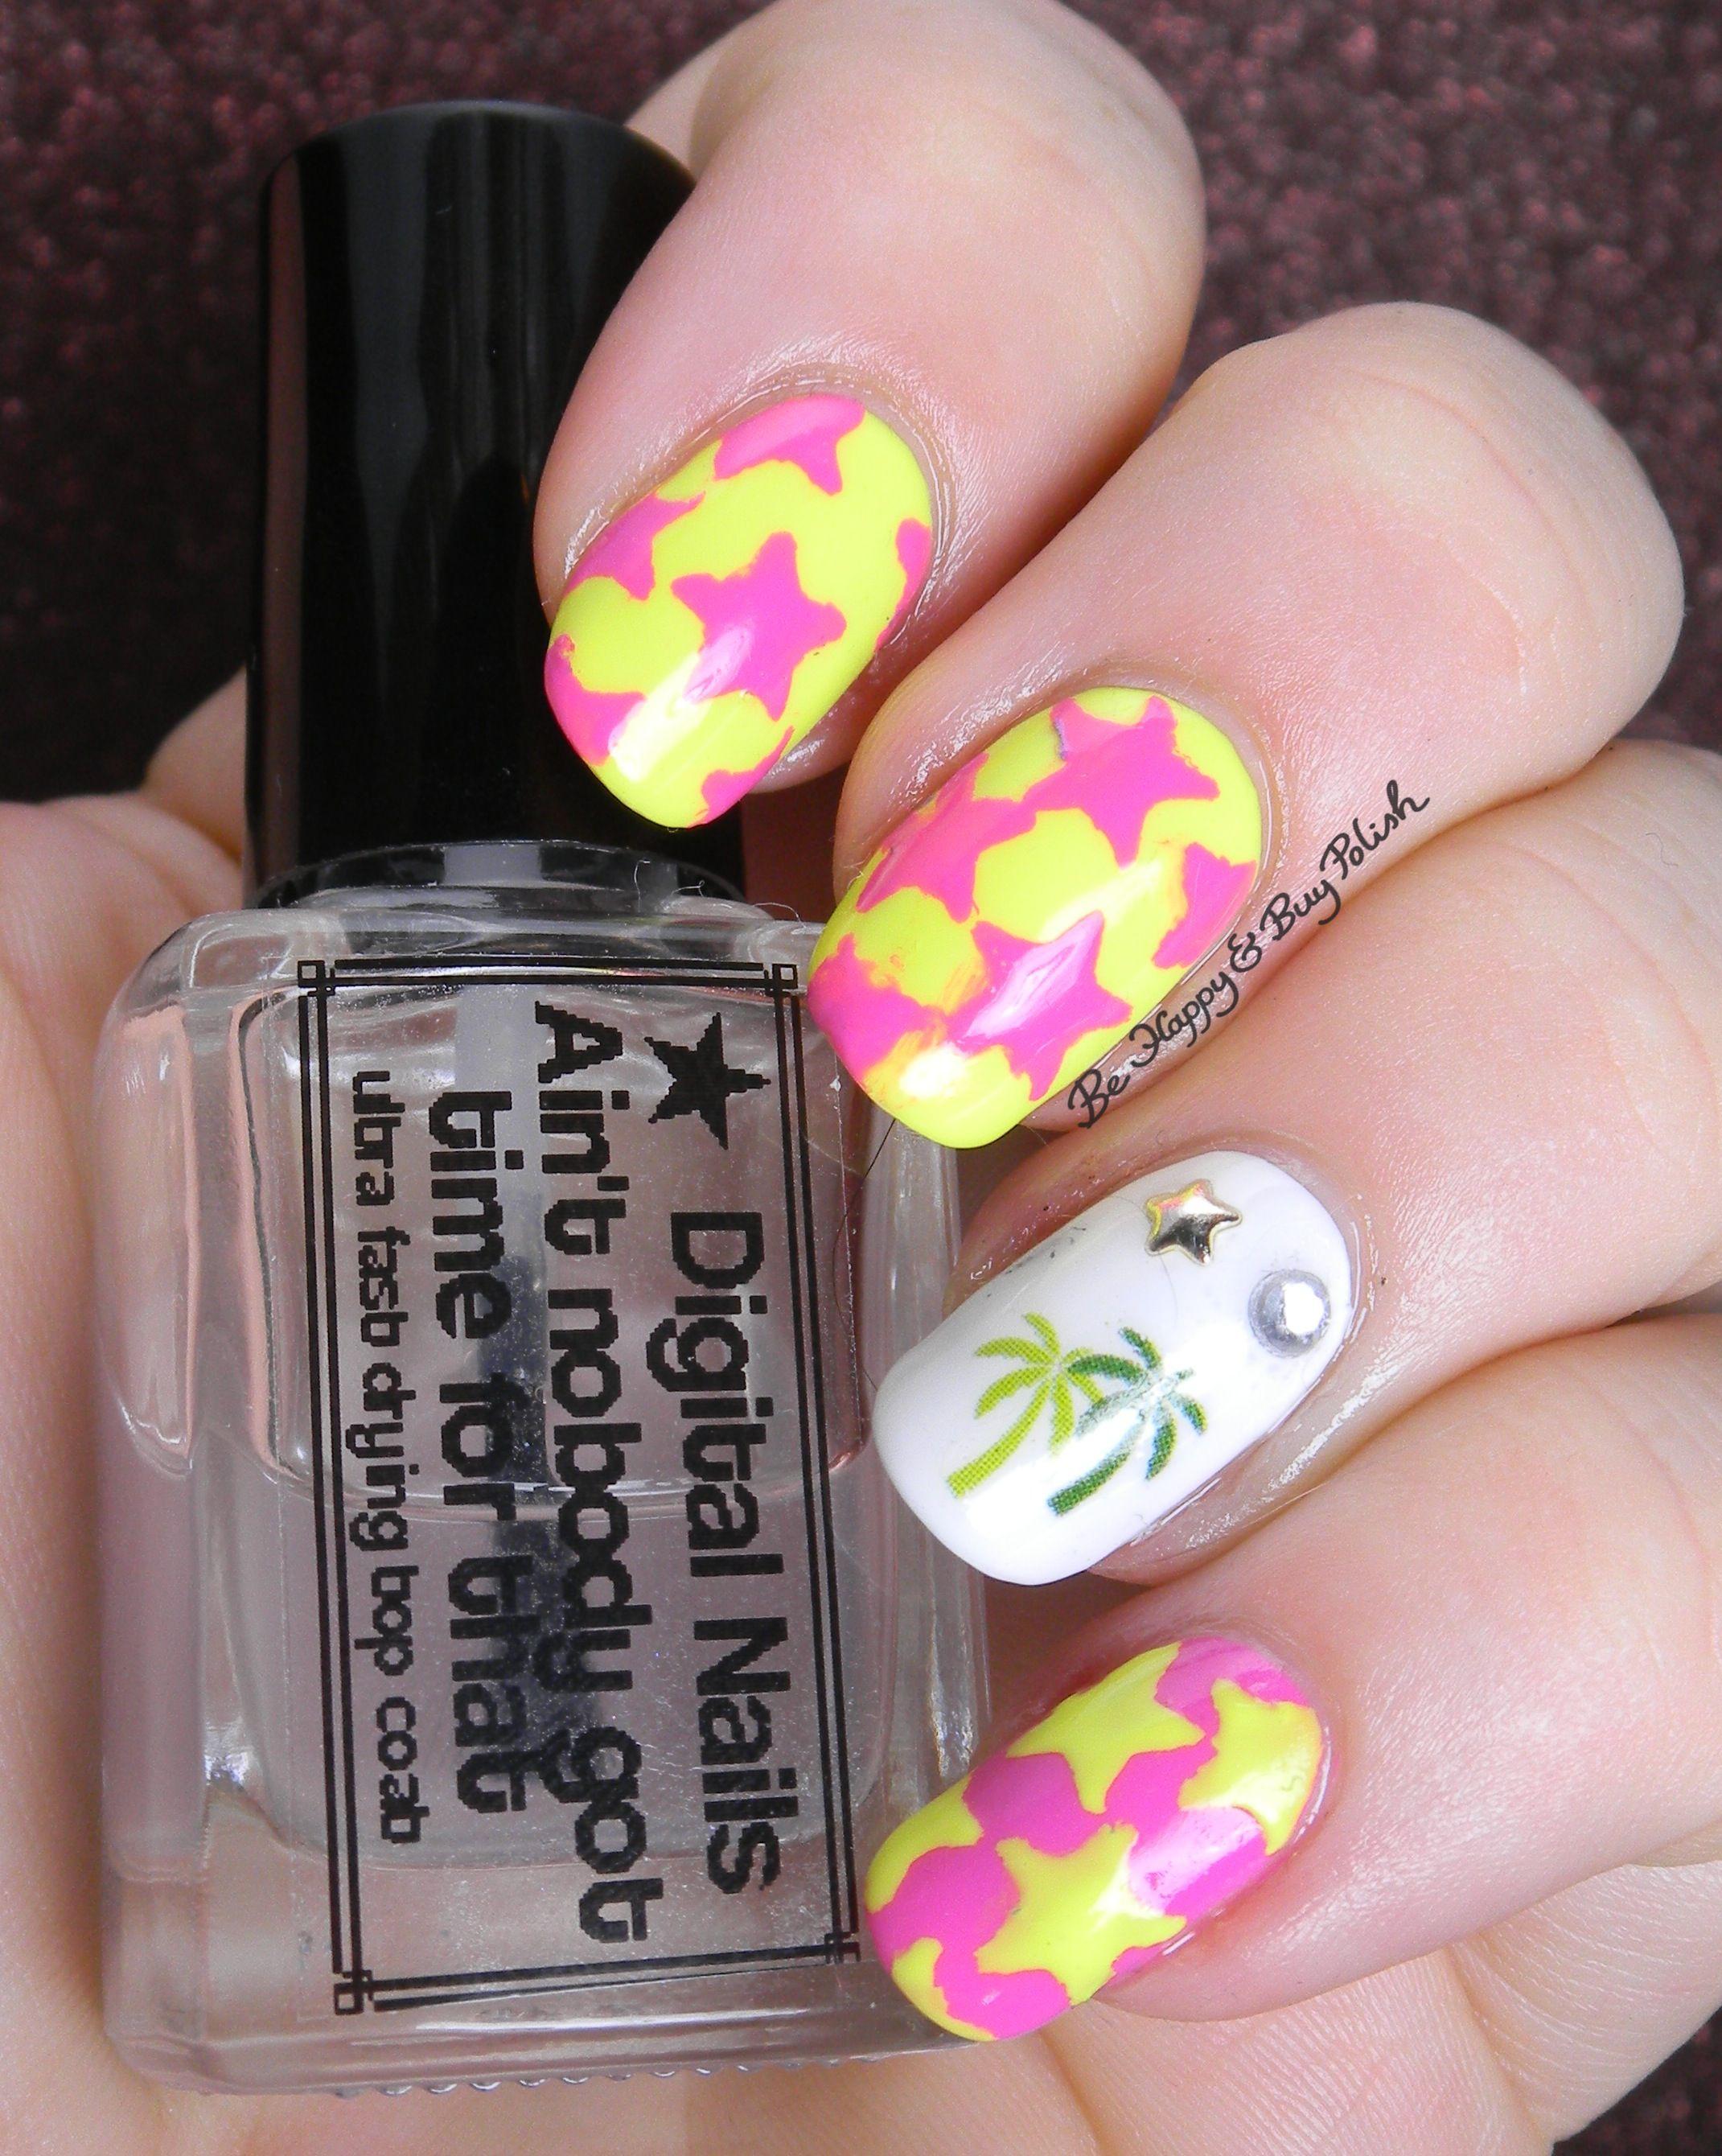 Neon Pink + Yellow Stars and Palm Tree Nail Art | Mädchenkram